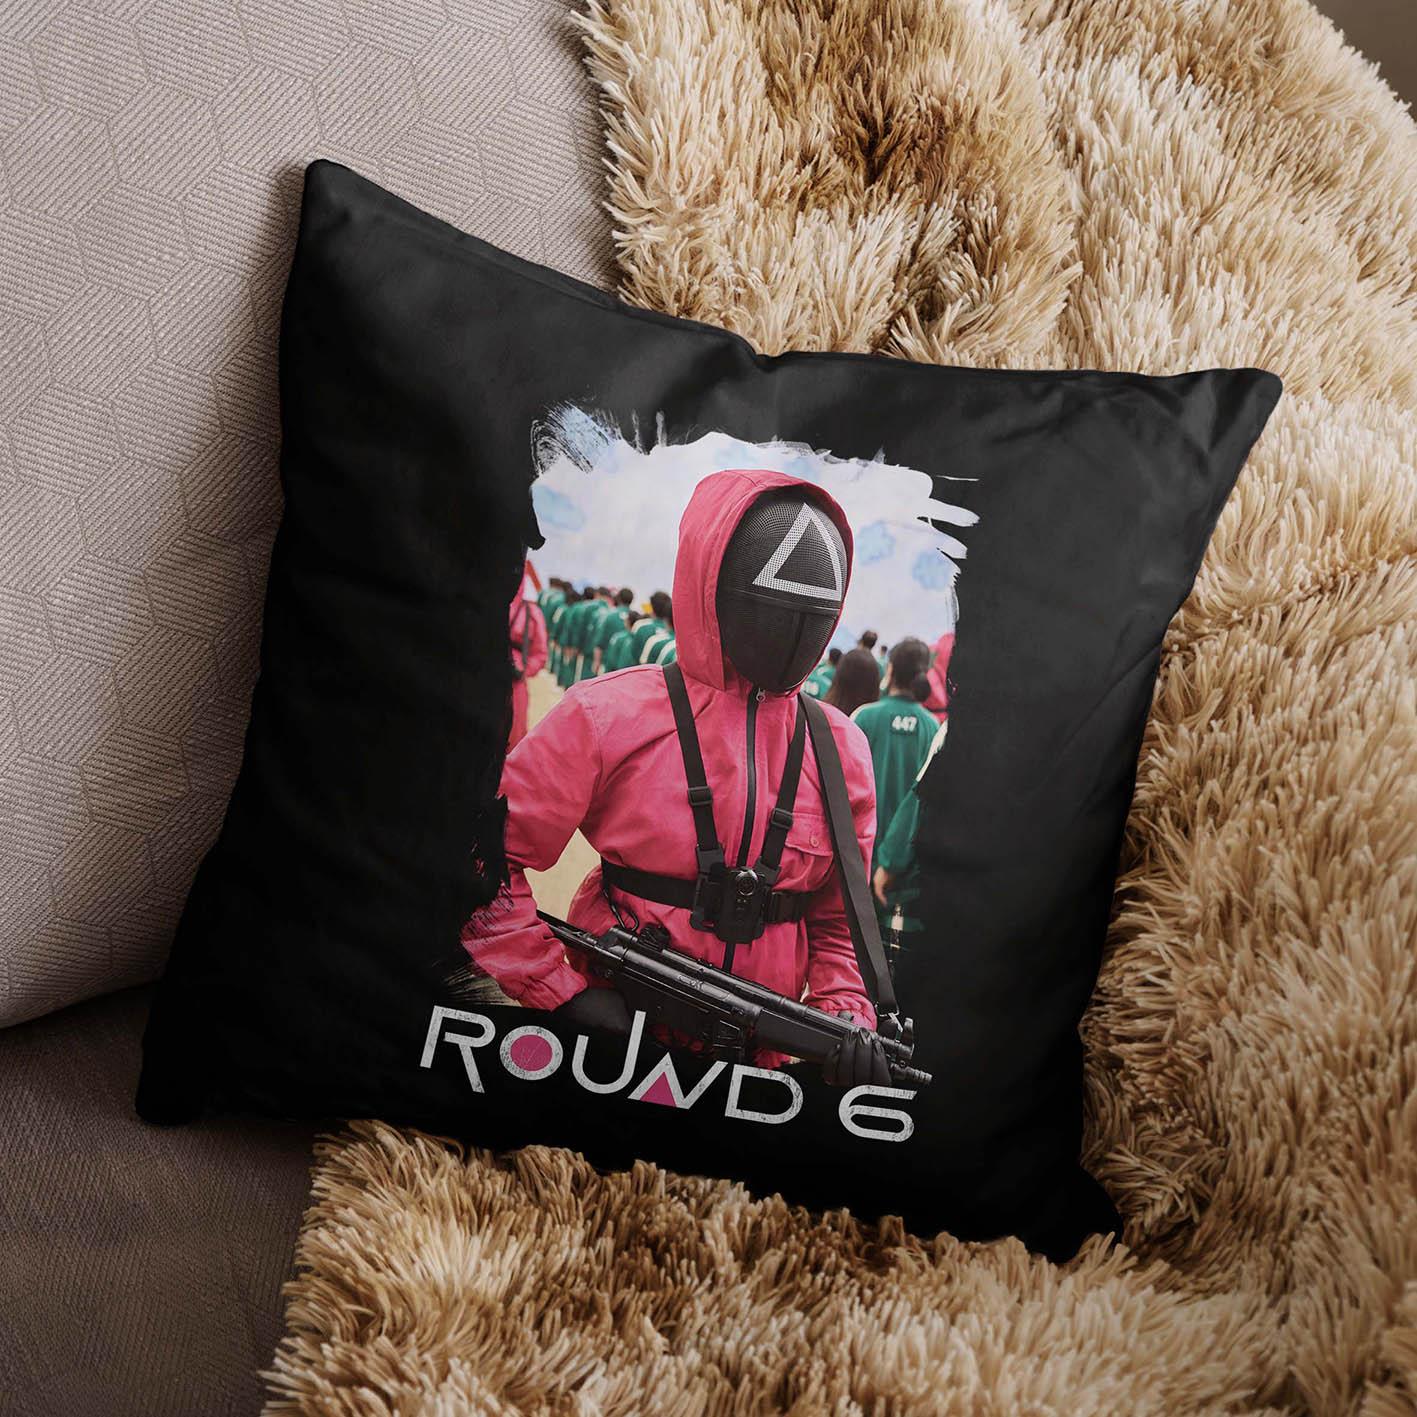 Almofada Round 6 Squid Game Netflix (Preta) - EV